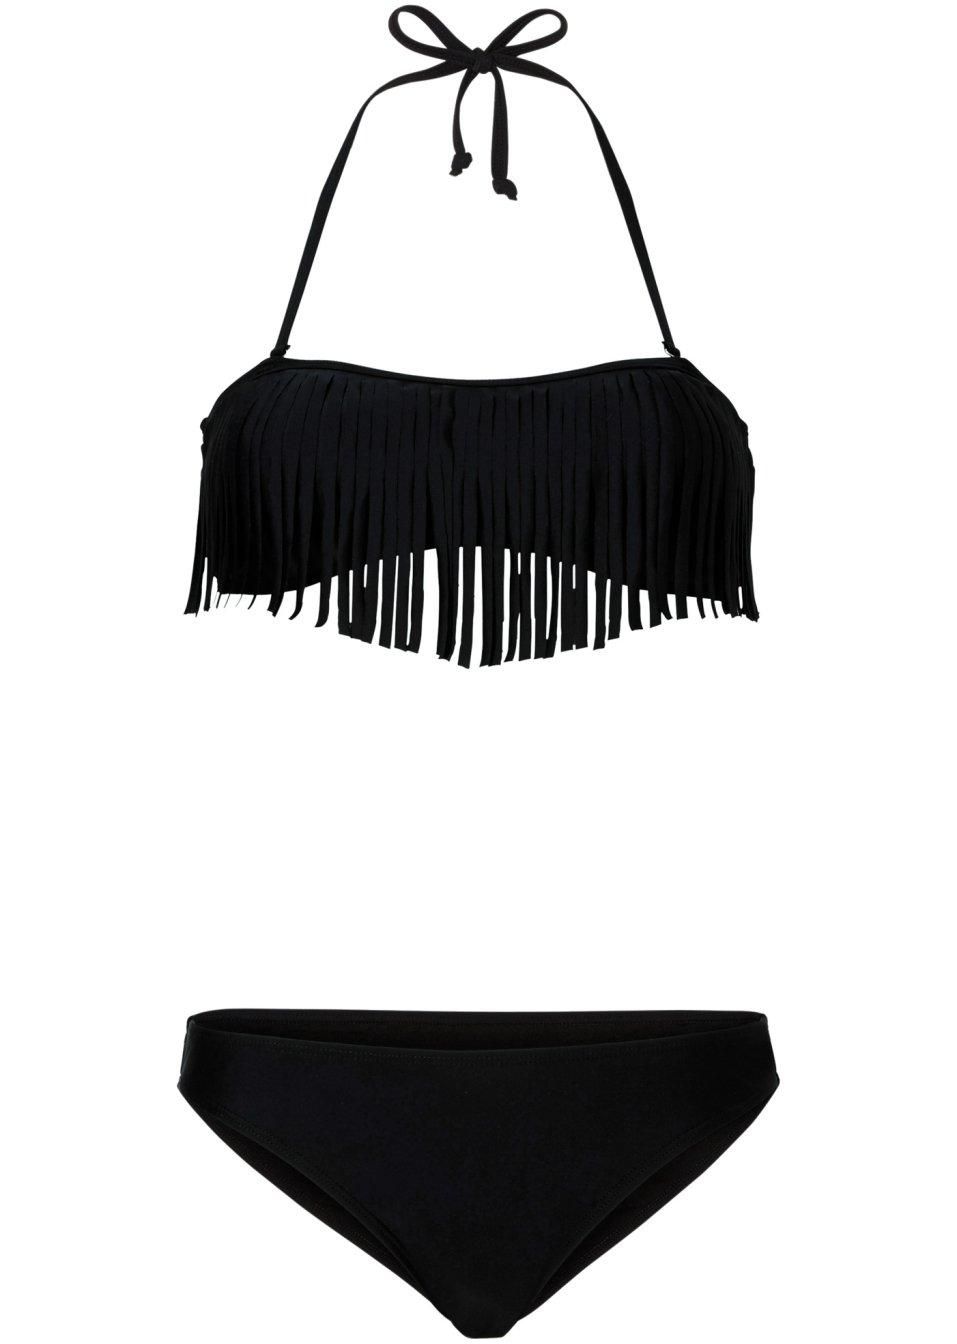 femininer bikini mit fransen detail schwarz. Black Bedroom Furniture Sets. Home Design Ideas